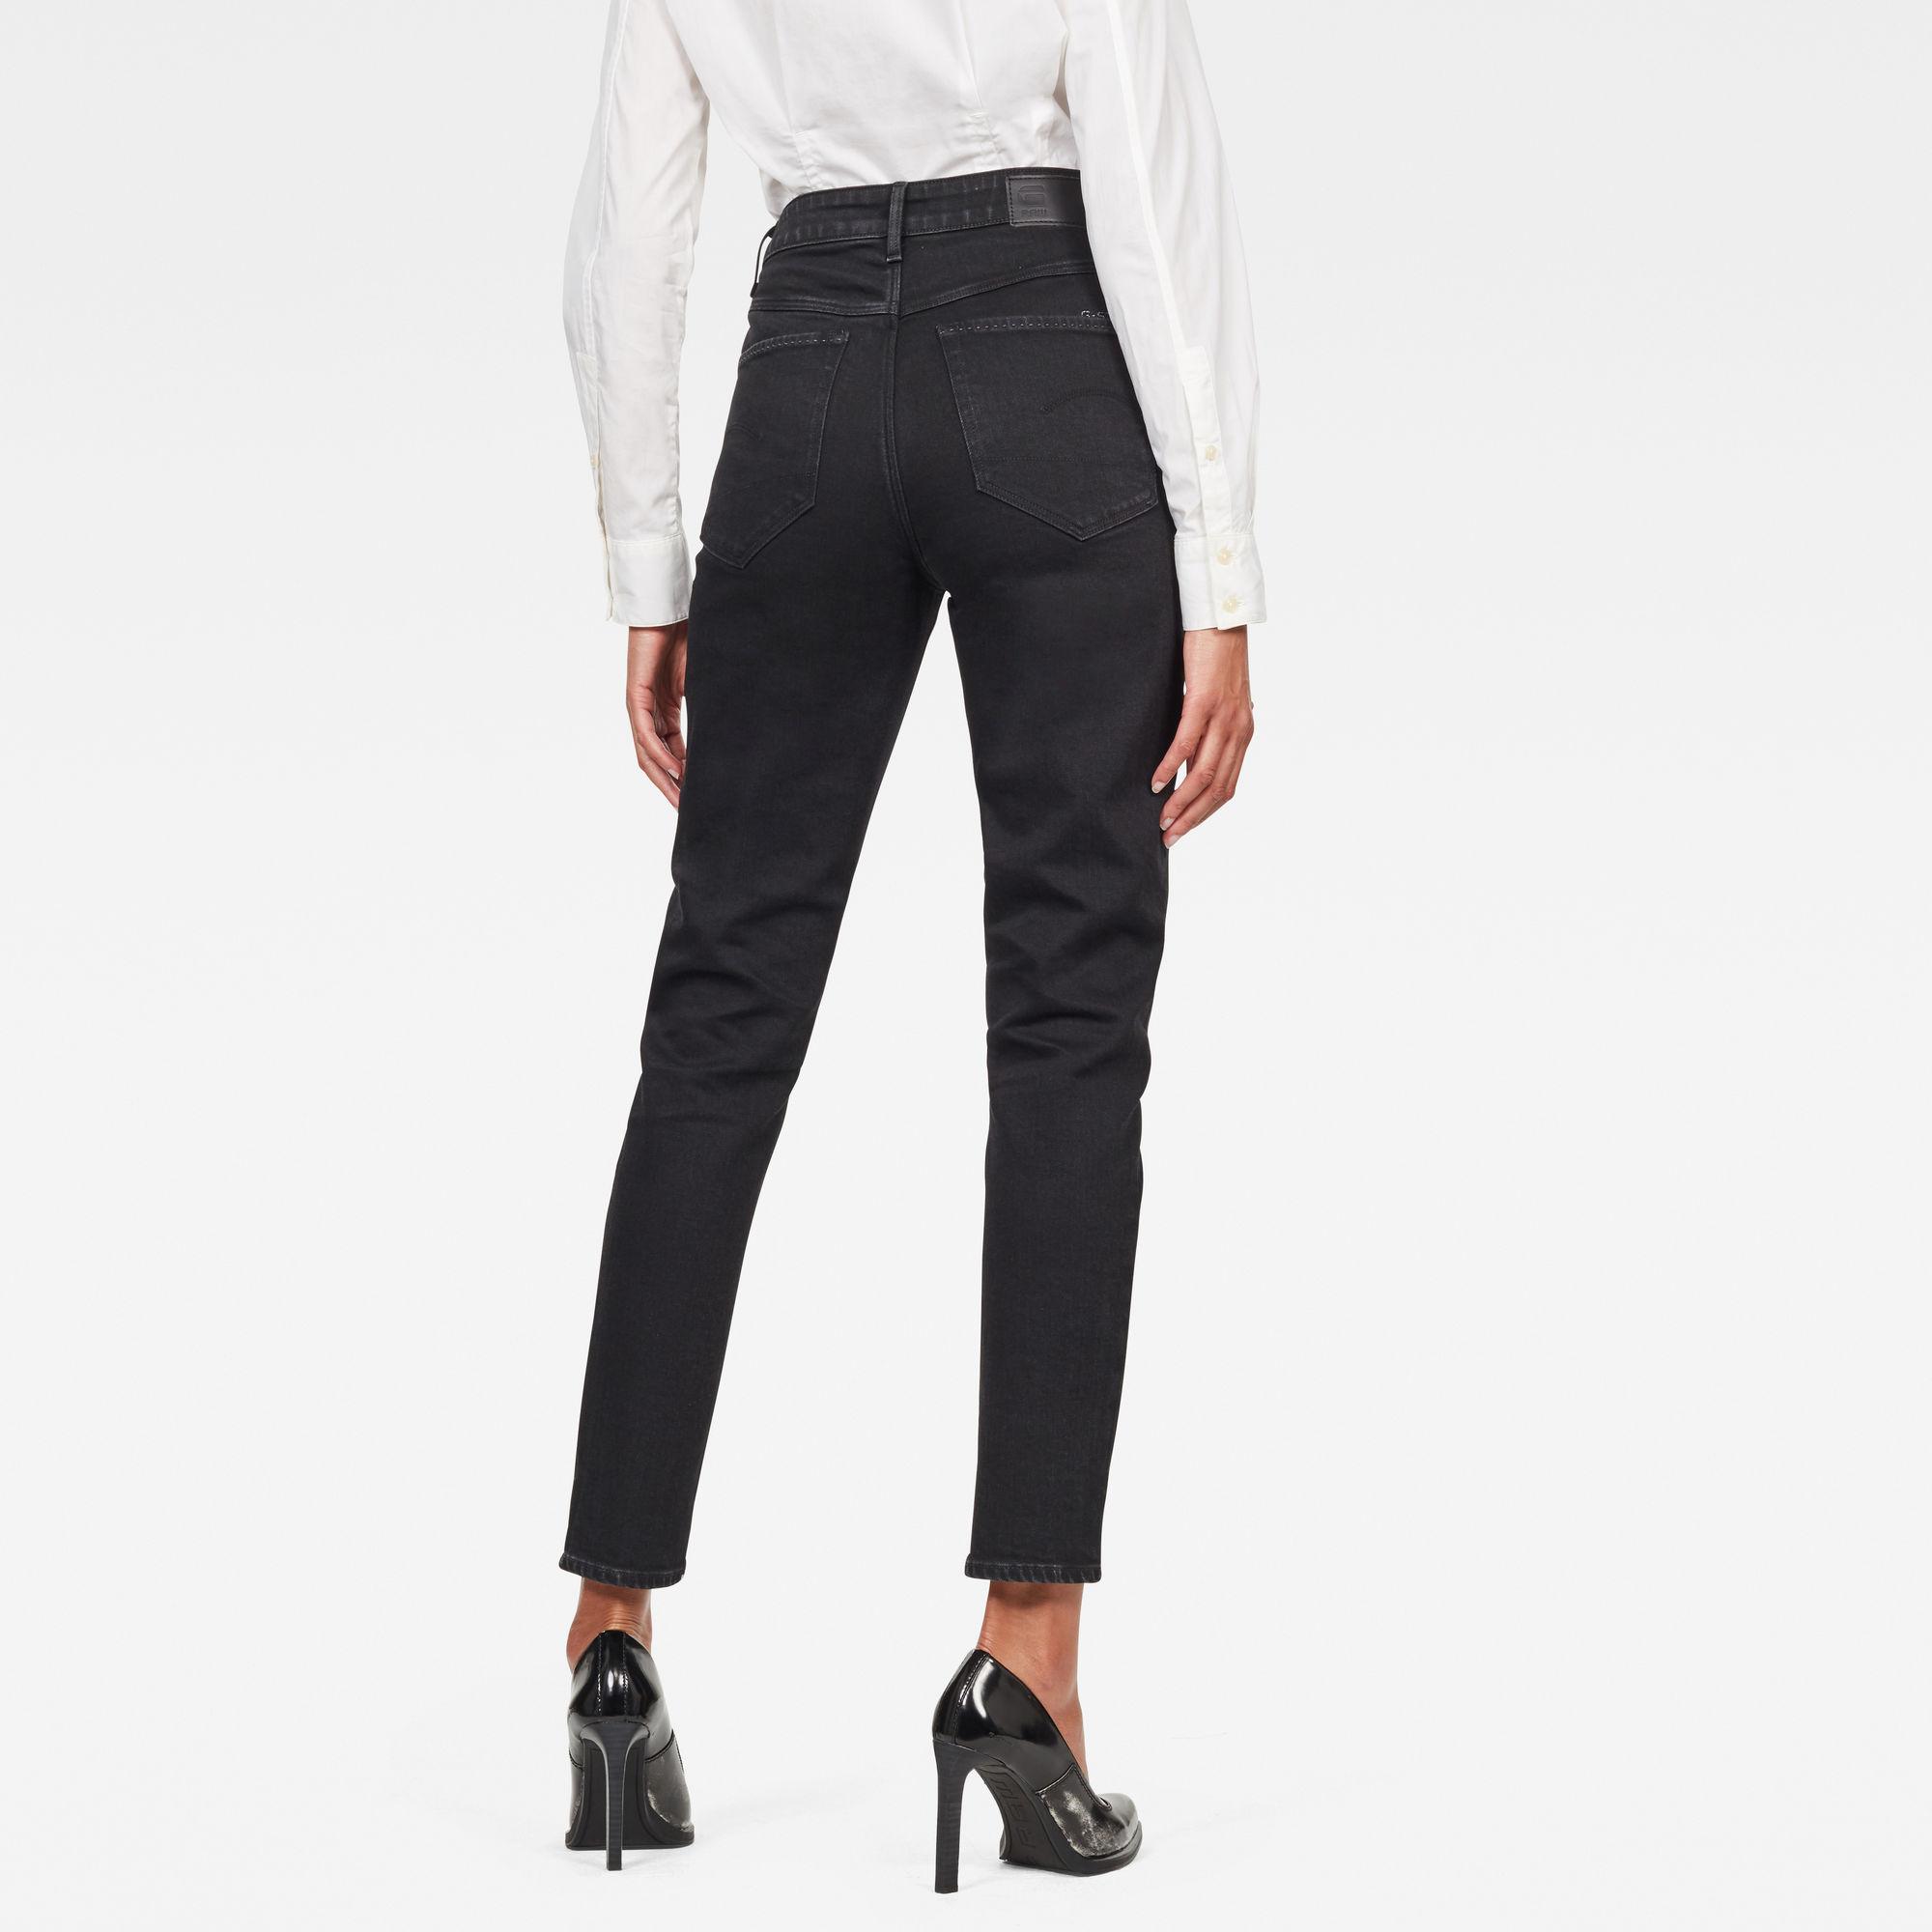 Navik High Slim Ankle Pop Jeans